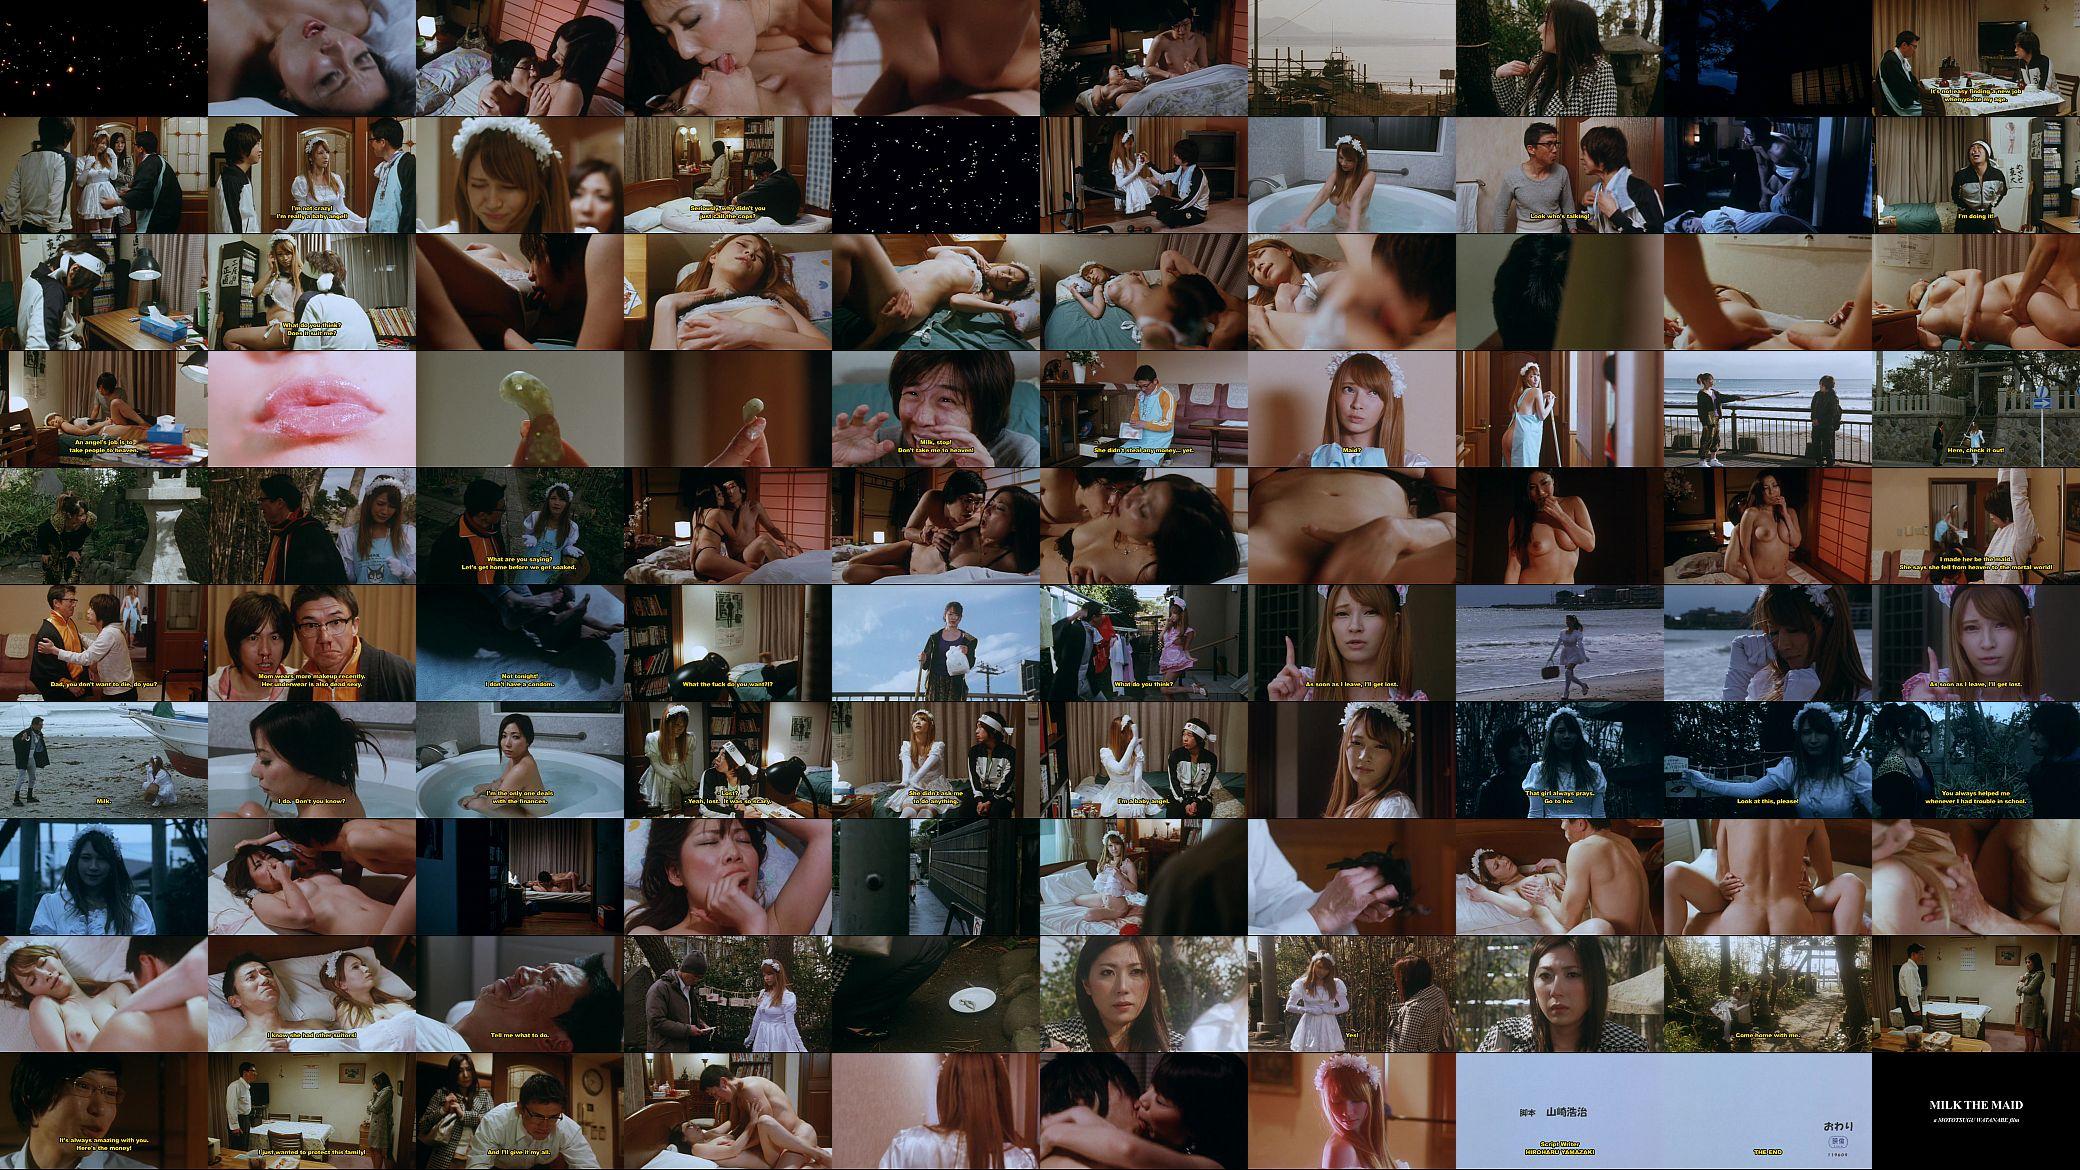 Aka Milky Love Porn milk.the.maid.2013.dvdrip - xvideos